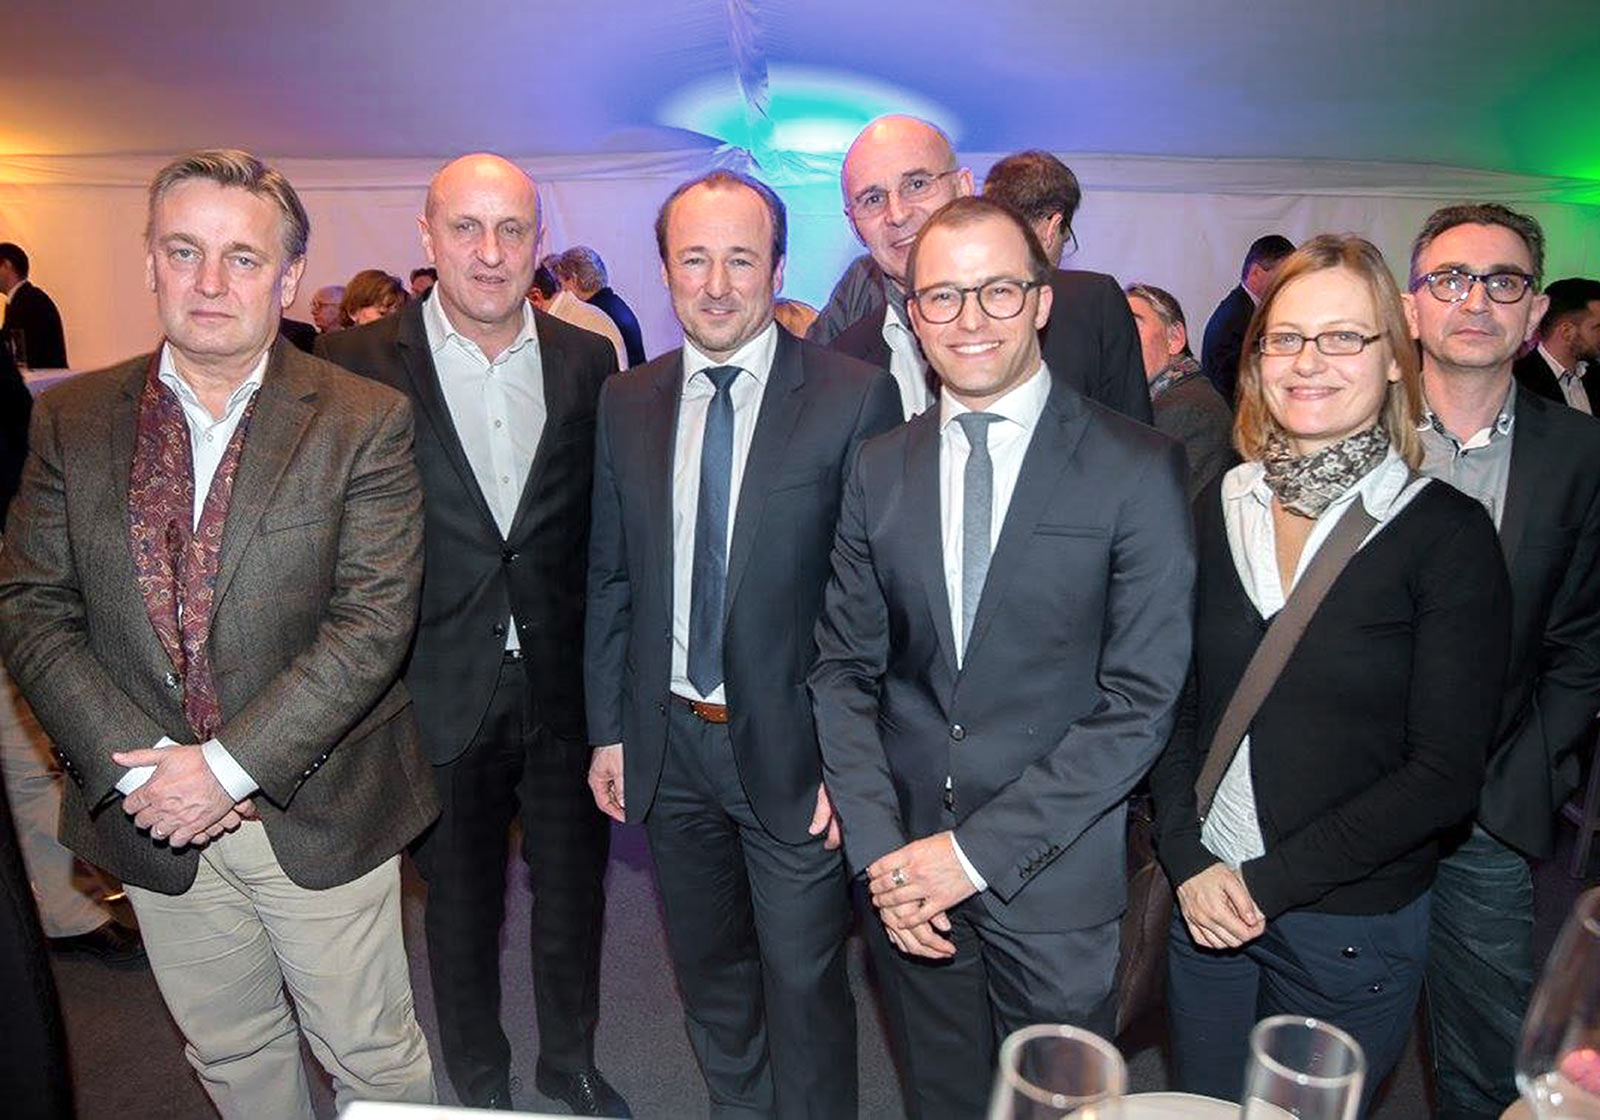 v.l.: Dario Travas (ATP), Horst Reiner (ATP), Herr Gappmayer (Bauherr), Heinz Lindner (ATP), Herr Pichler (Projektsteuerer), Birgit Reiterer (ATP). Foto:Martin Hörmandinger